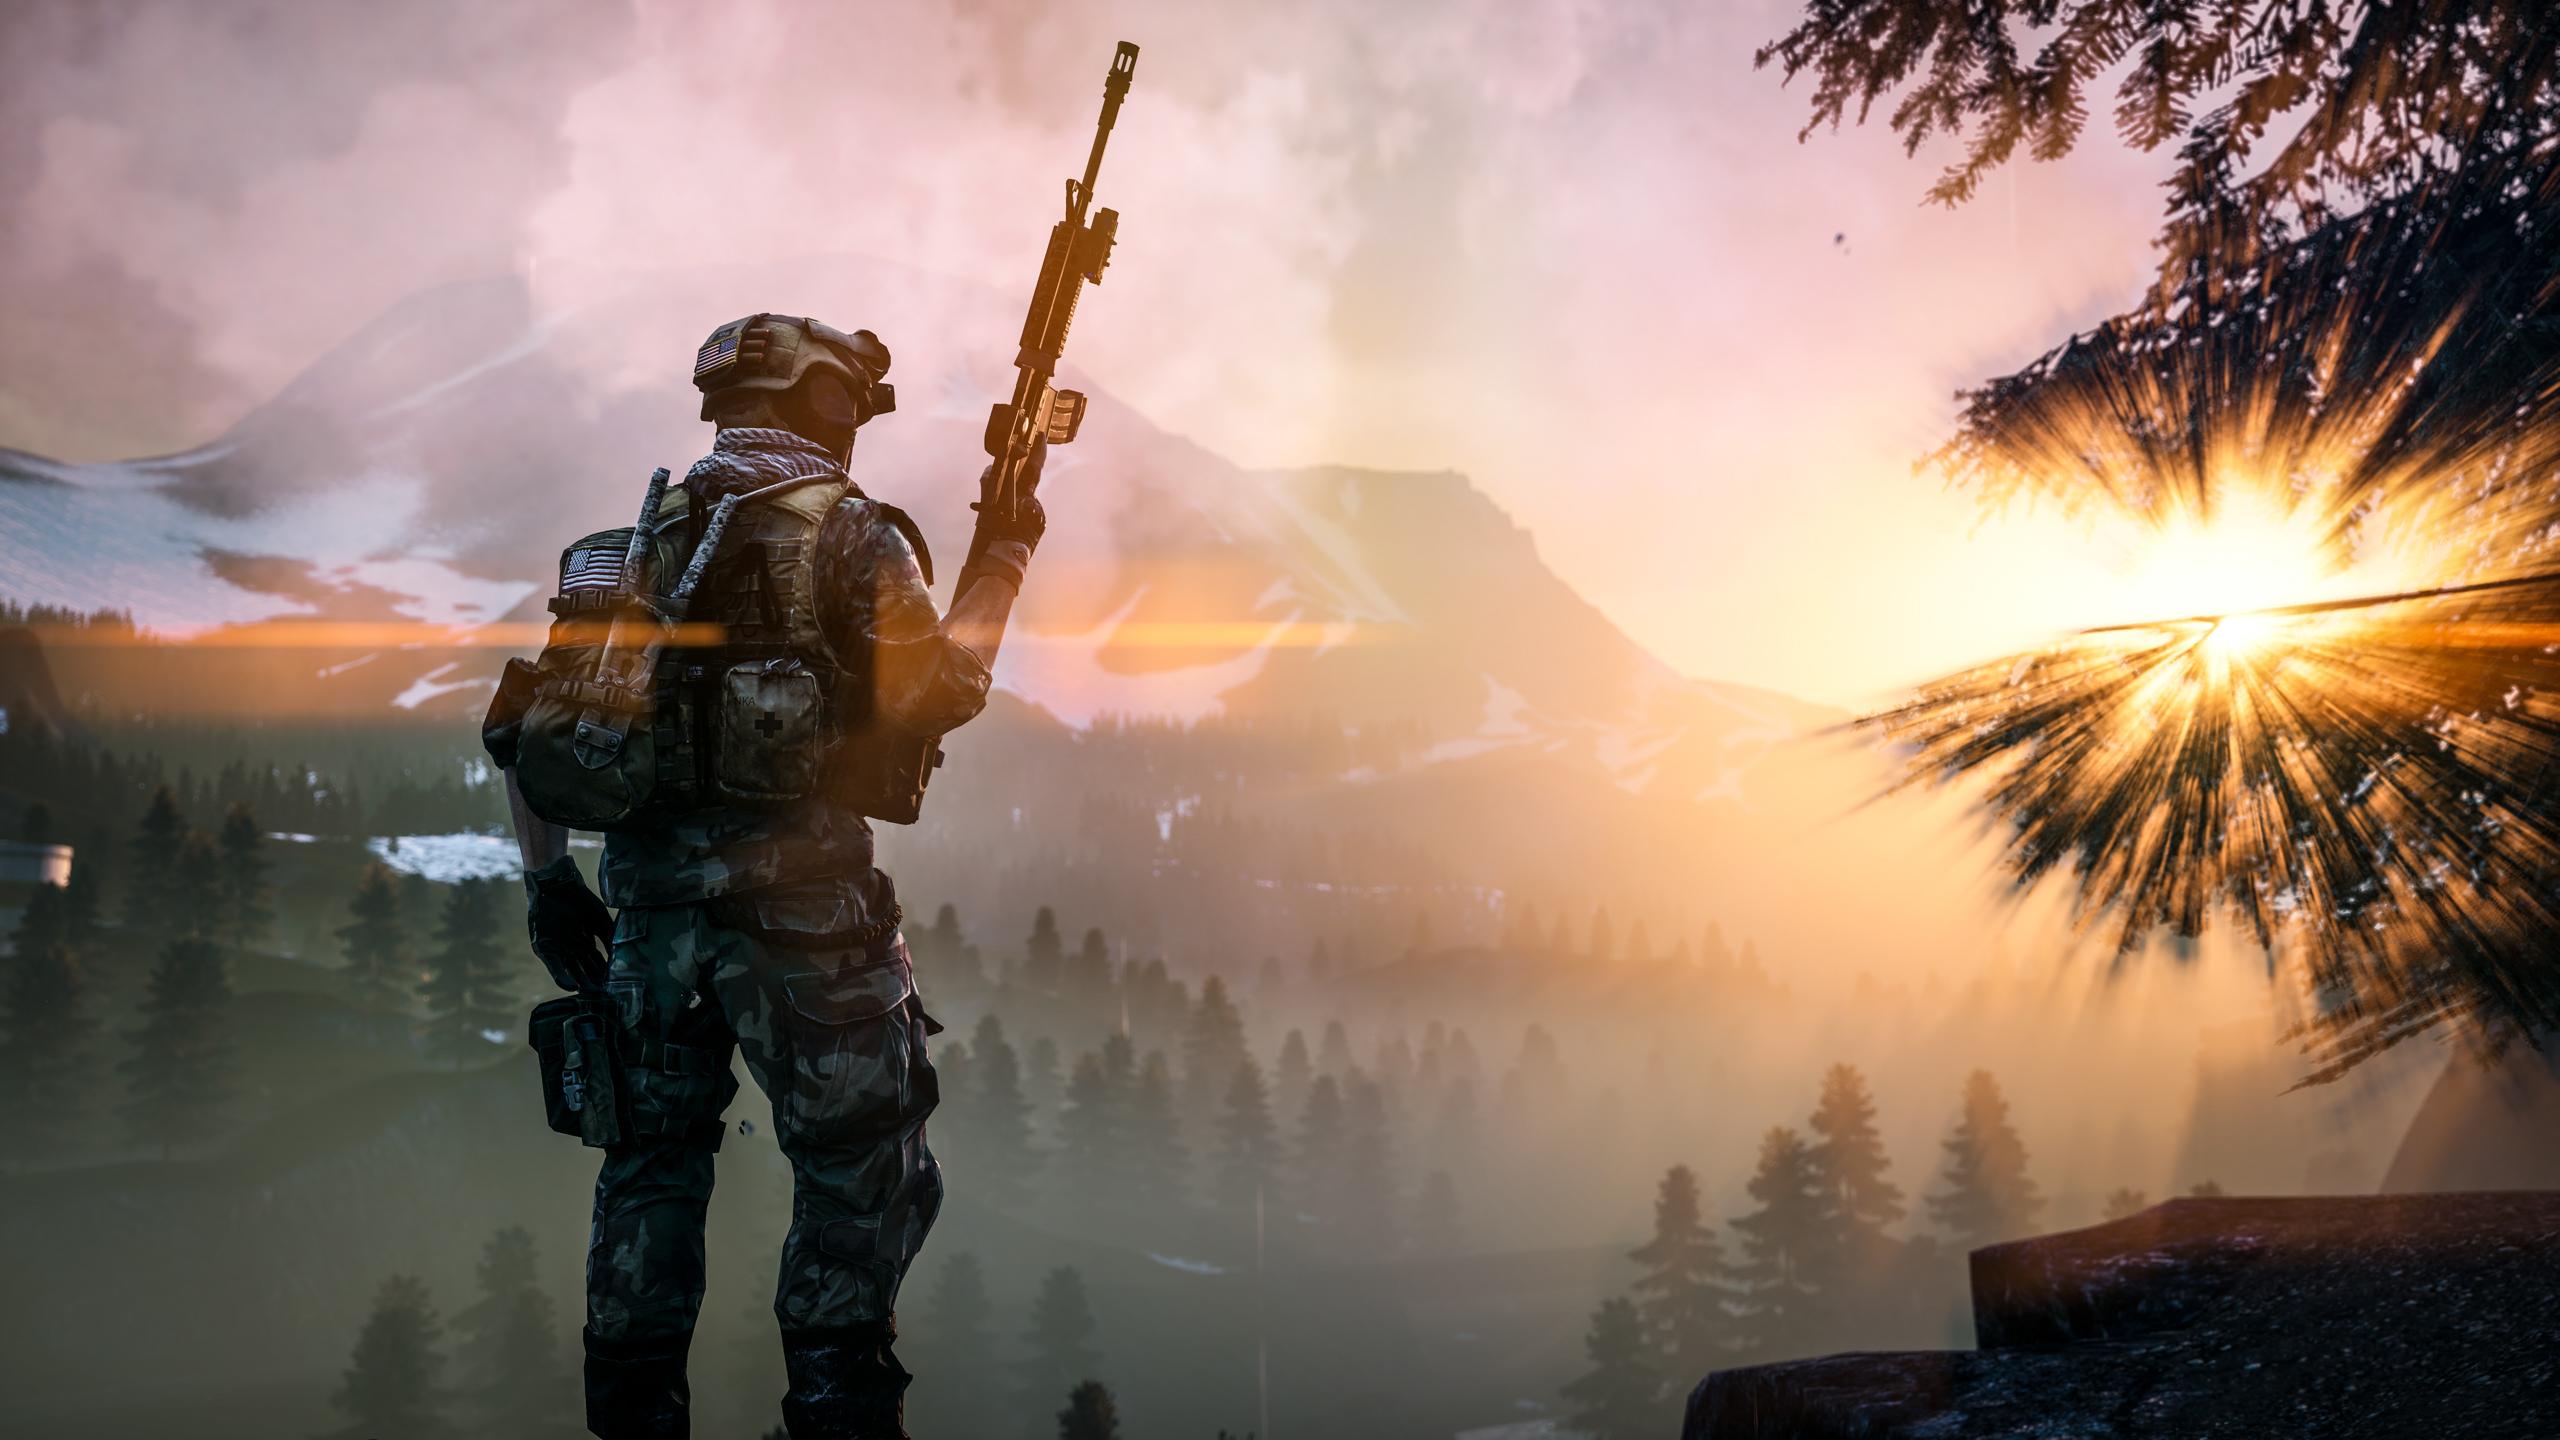 Battlefield 4 Full HD Fond D'écran And Arrière-Plan